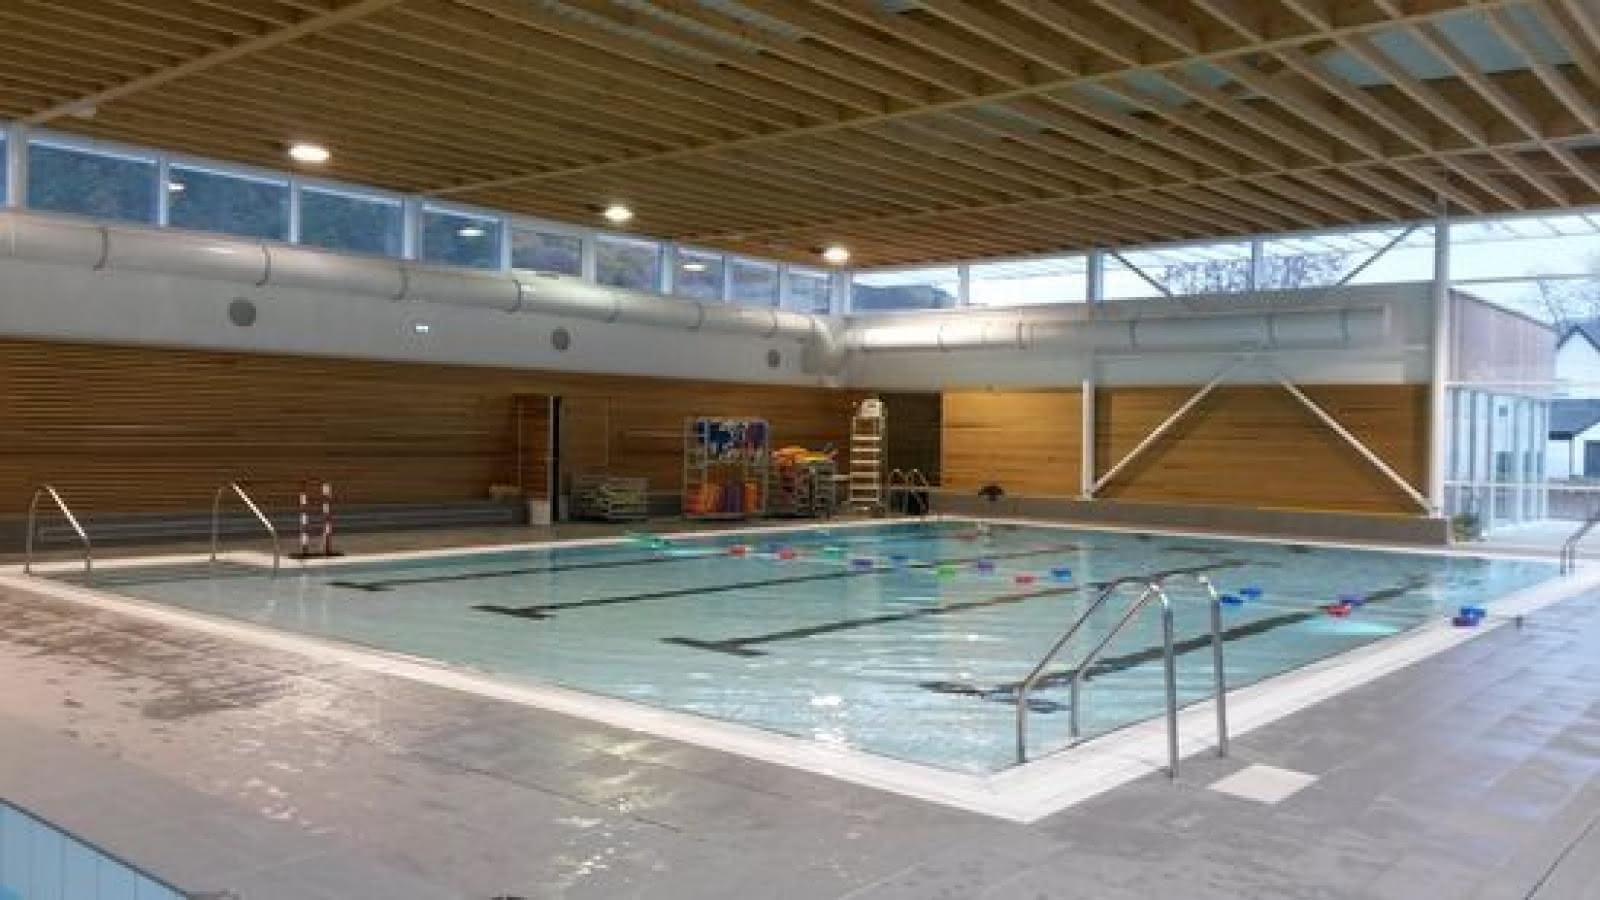 Swimingpool - Tagolsheim | Visit Alsace concernant Piscine Tagolsheim